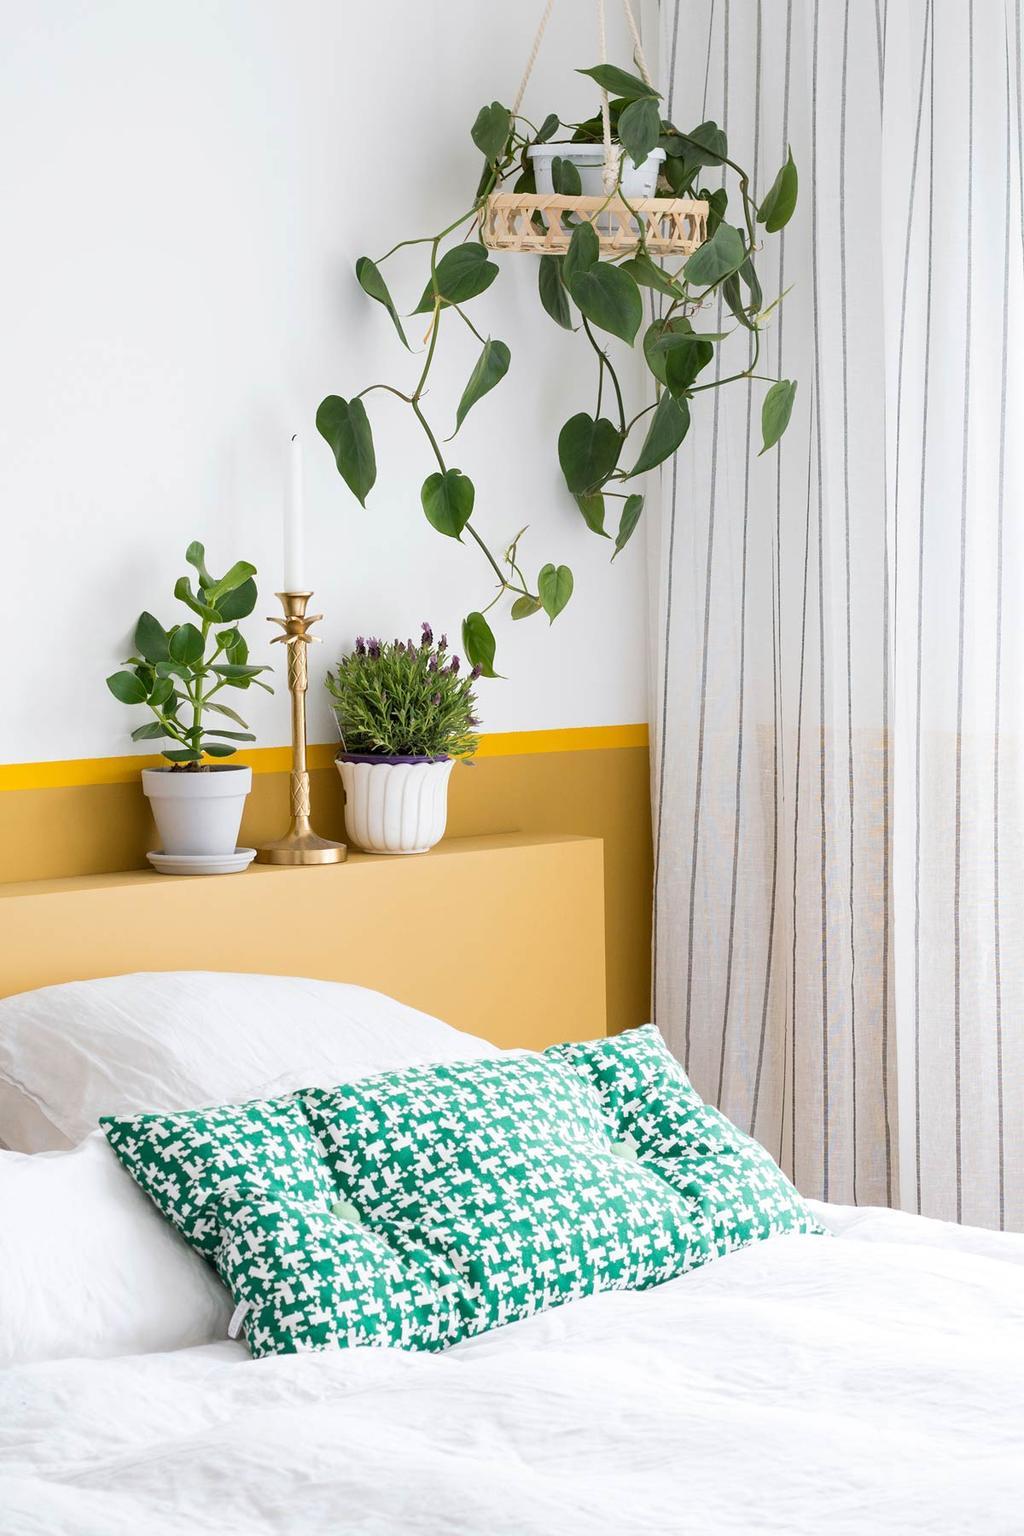 Wit bed, gele lambrisering en planten in de slaapkamer